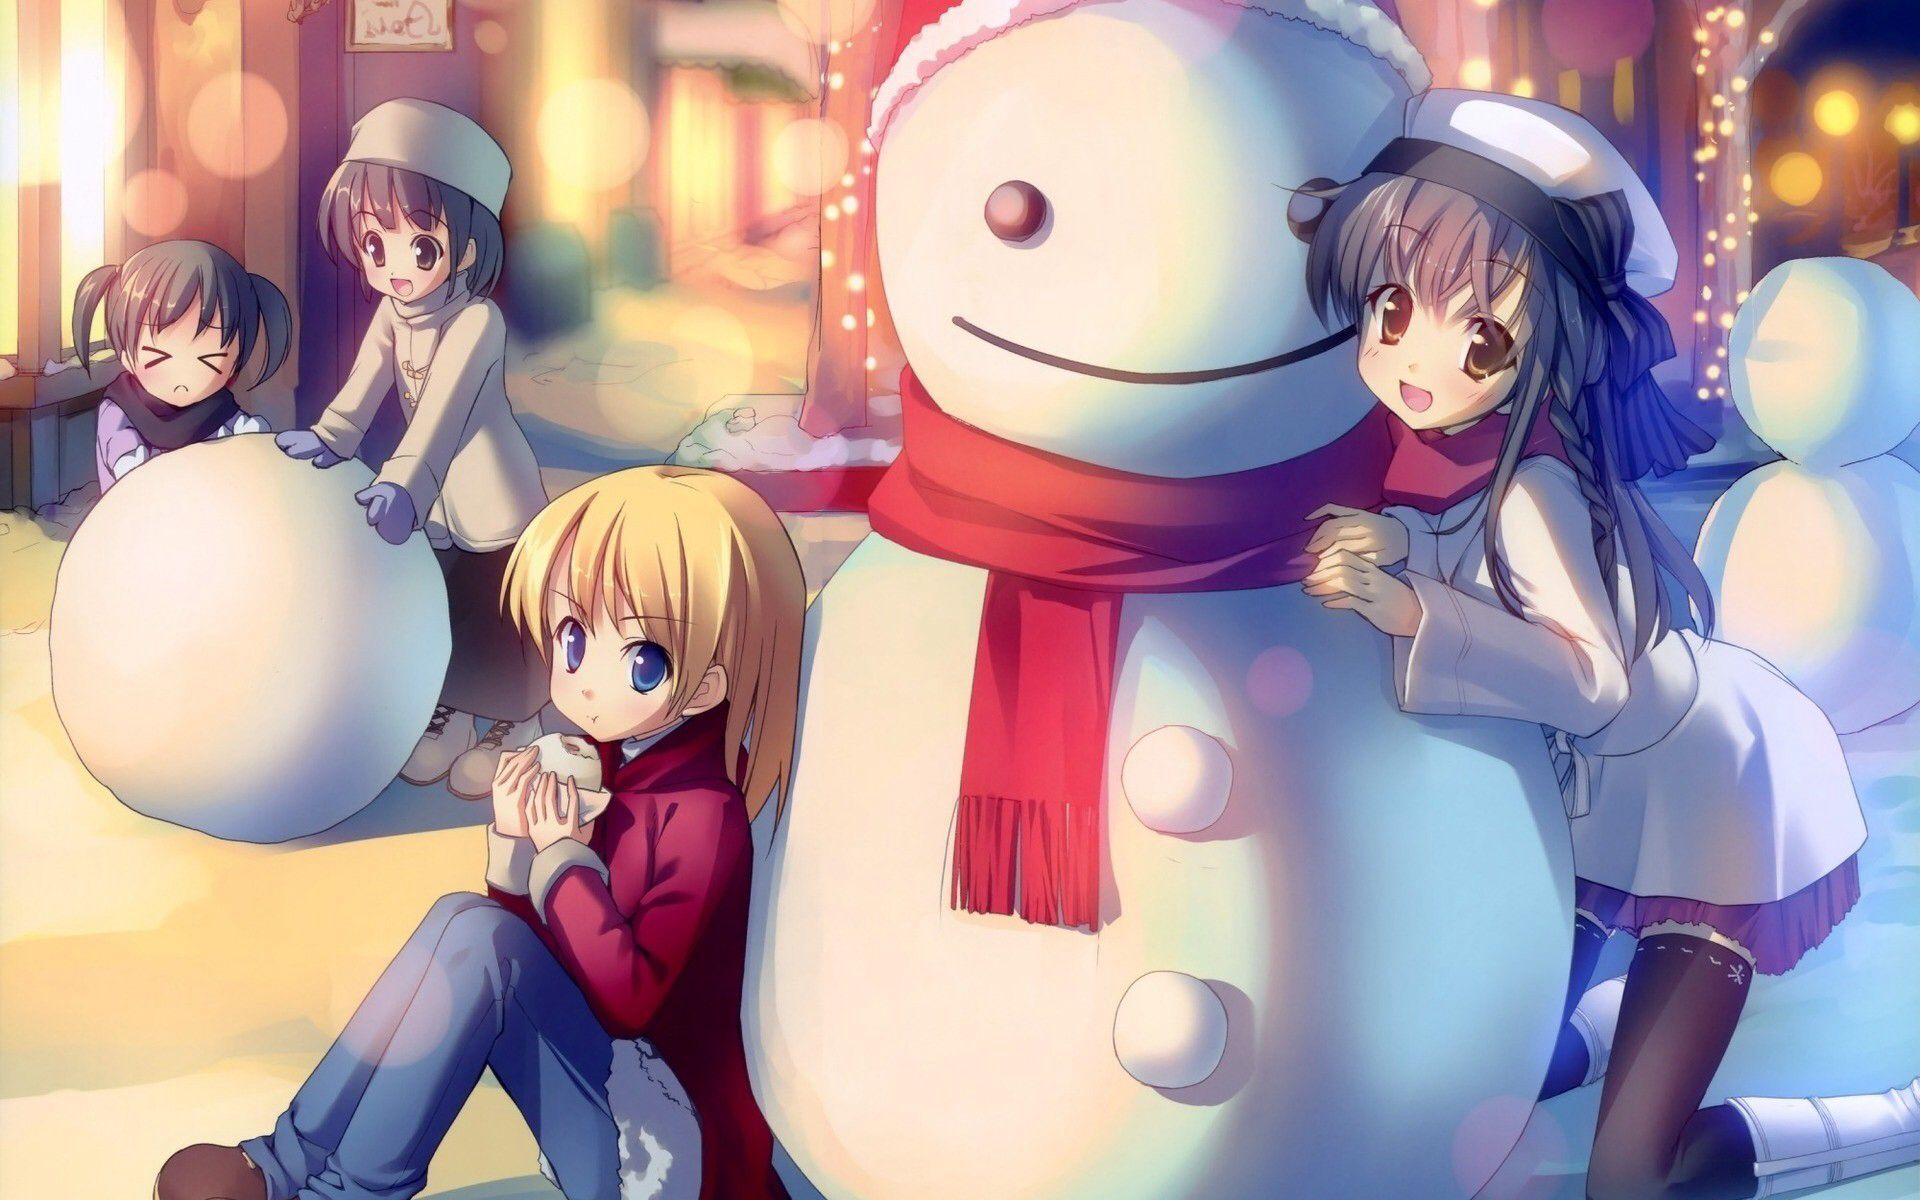 Anime Christmas Anime Christmas Anime Child Christmas Wallpaper Hd